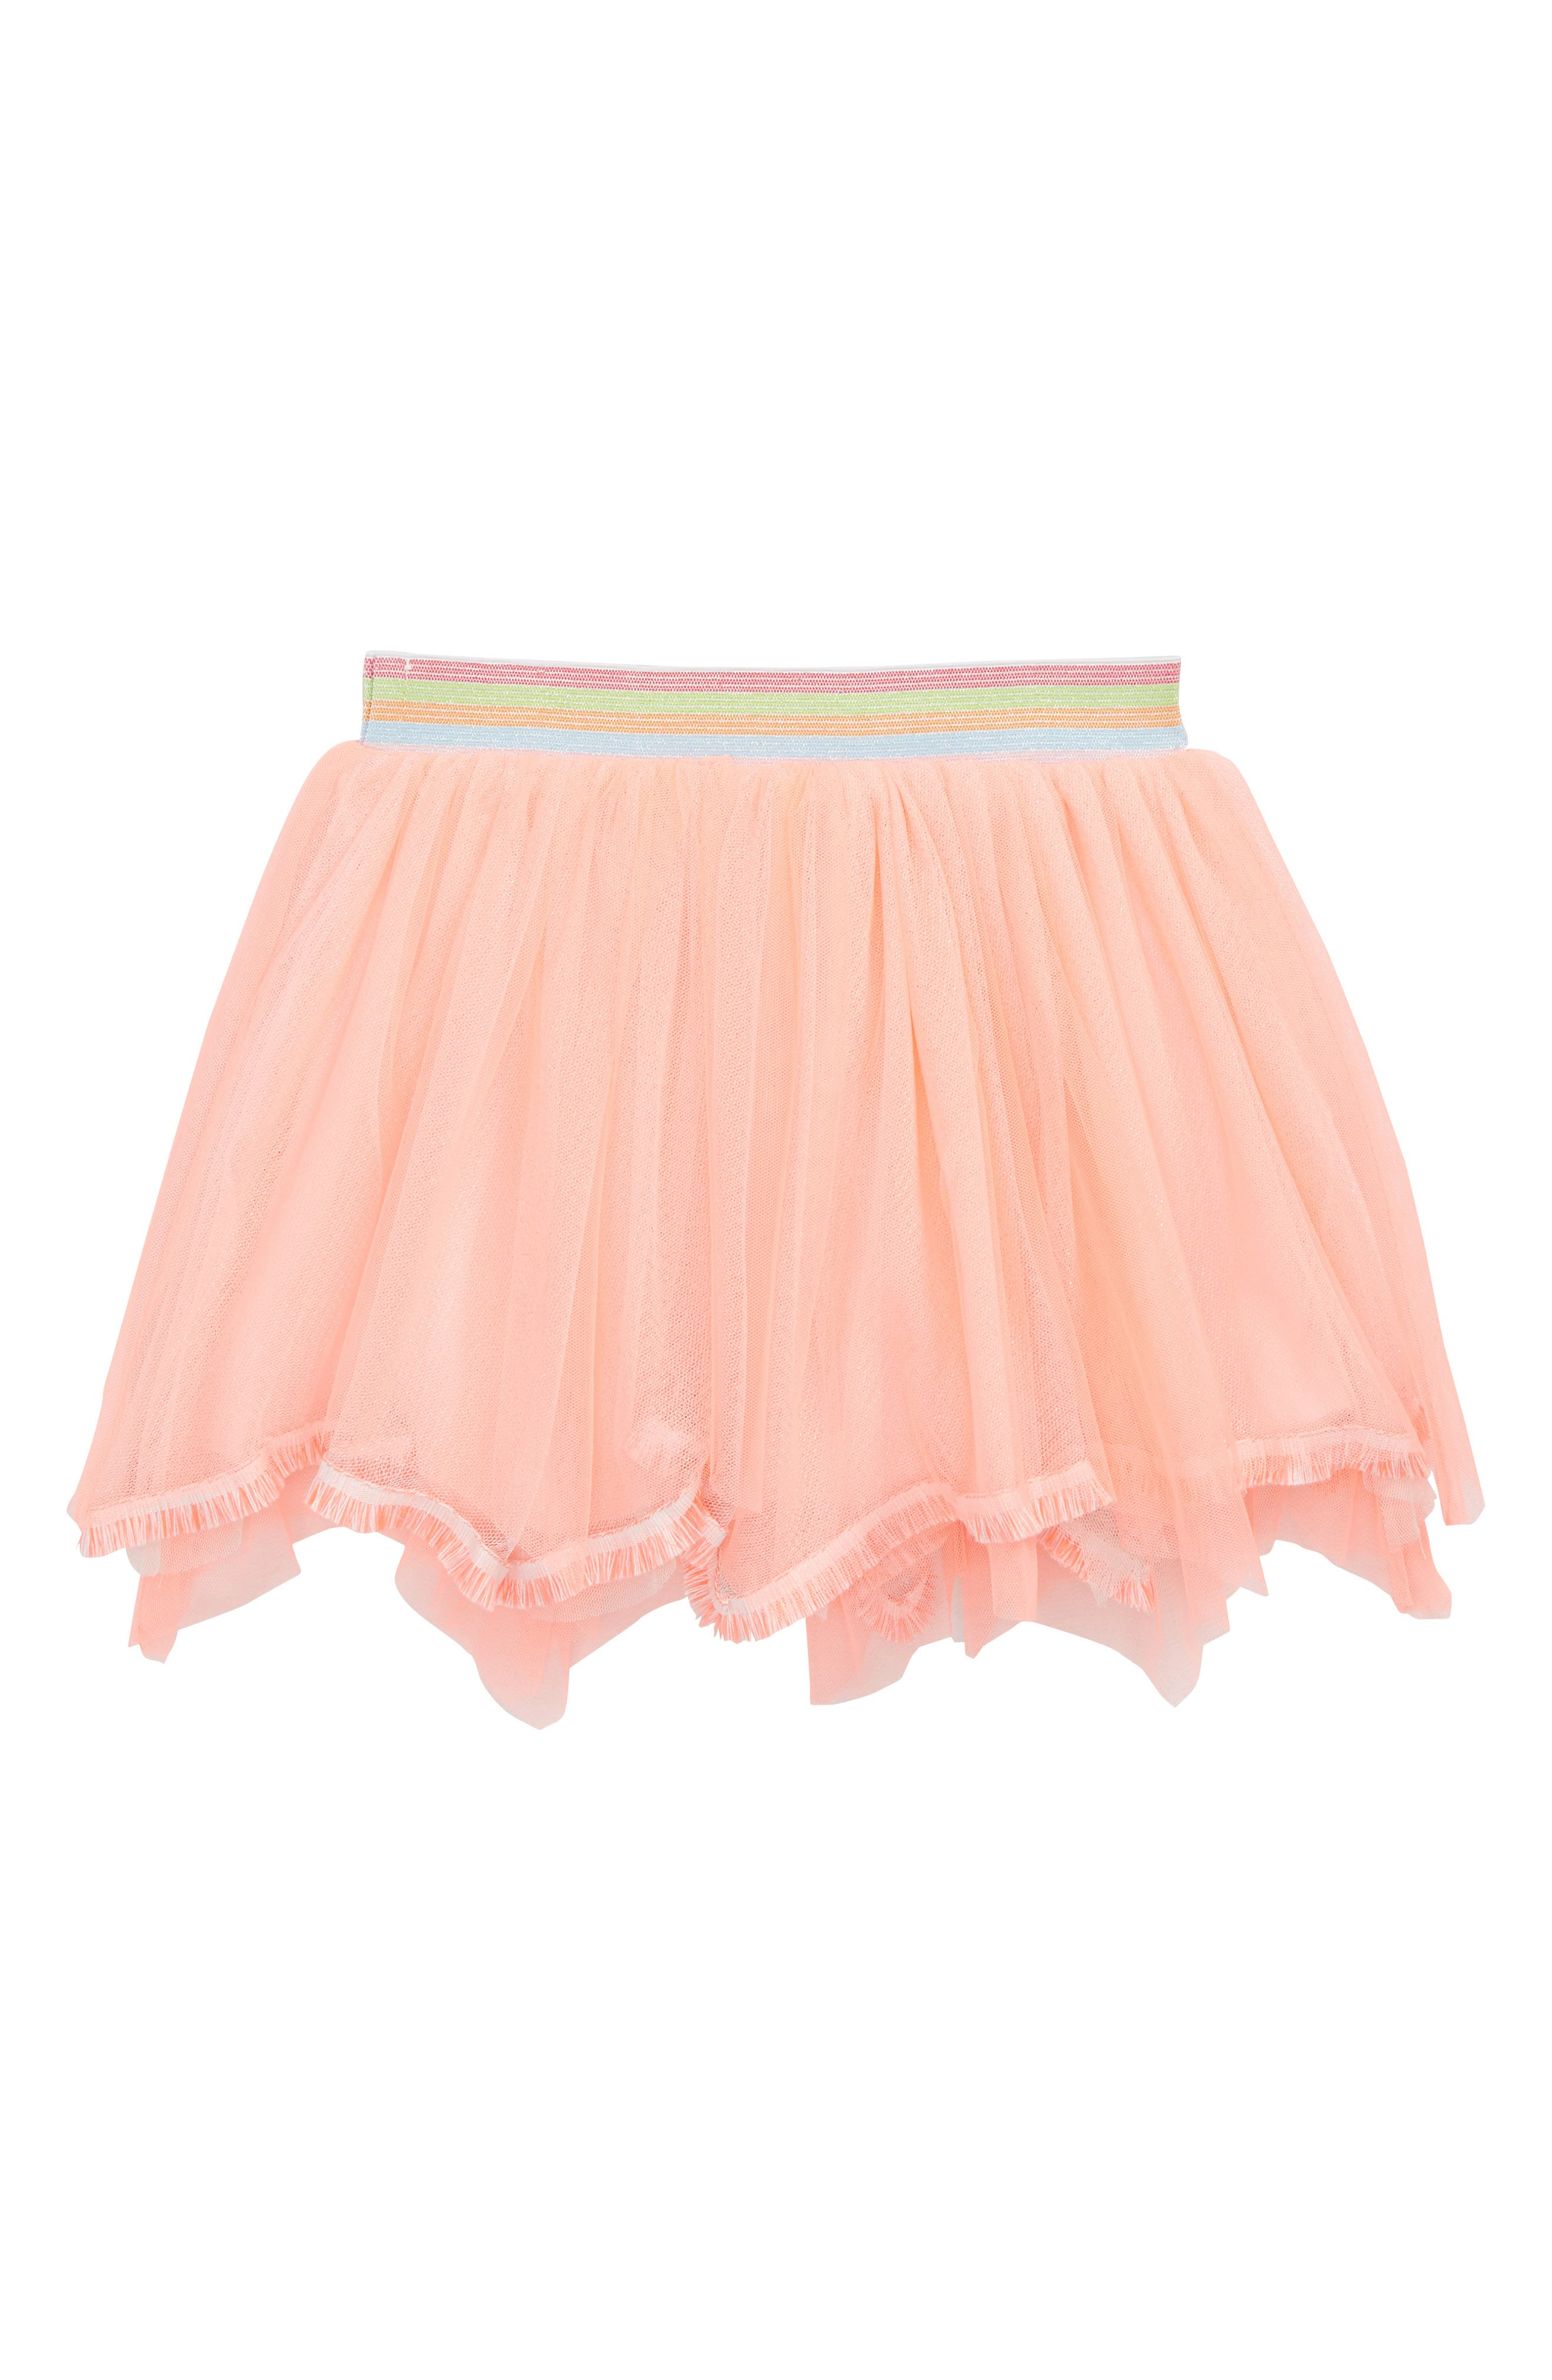 Fringed Hem Tutu Skirt,                             Main thumbnail 1, color,                             950